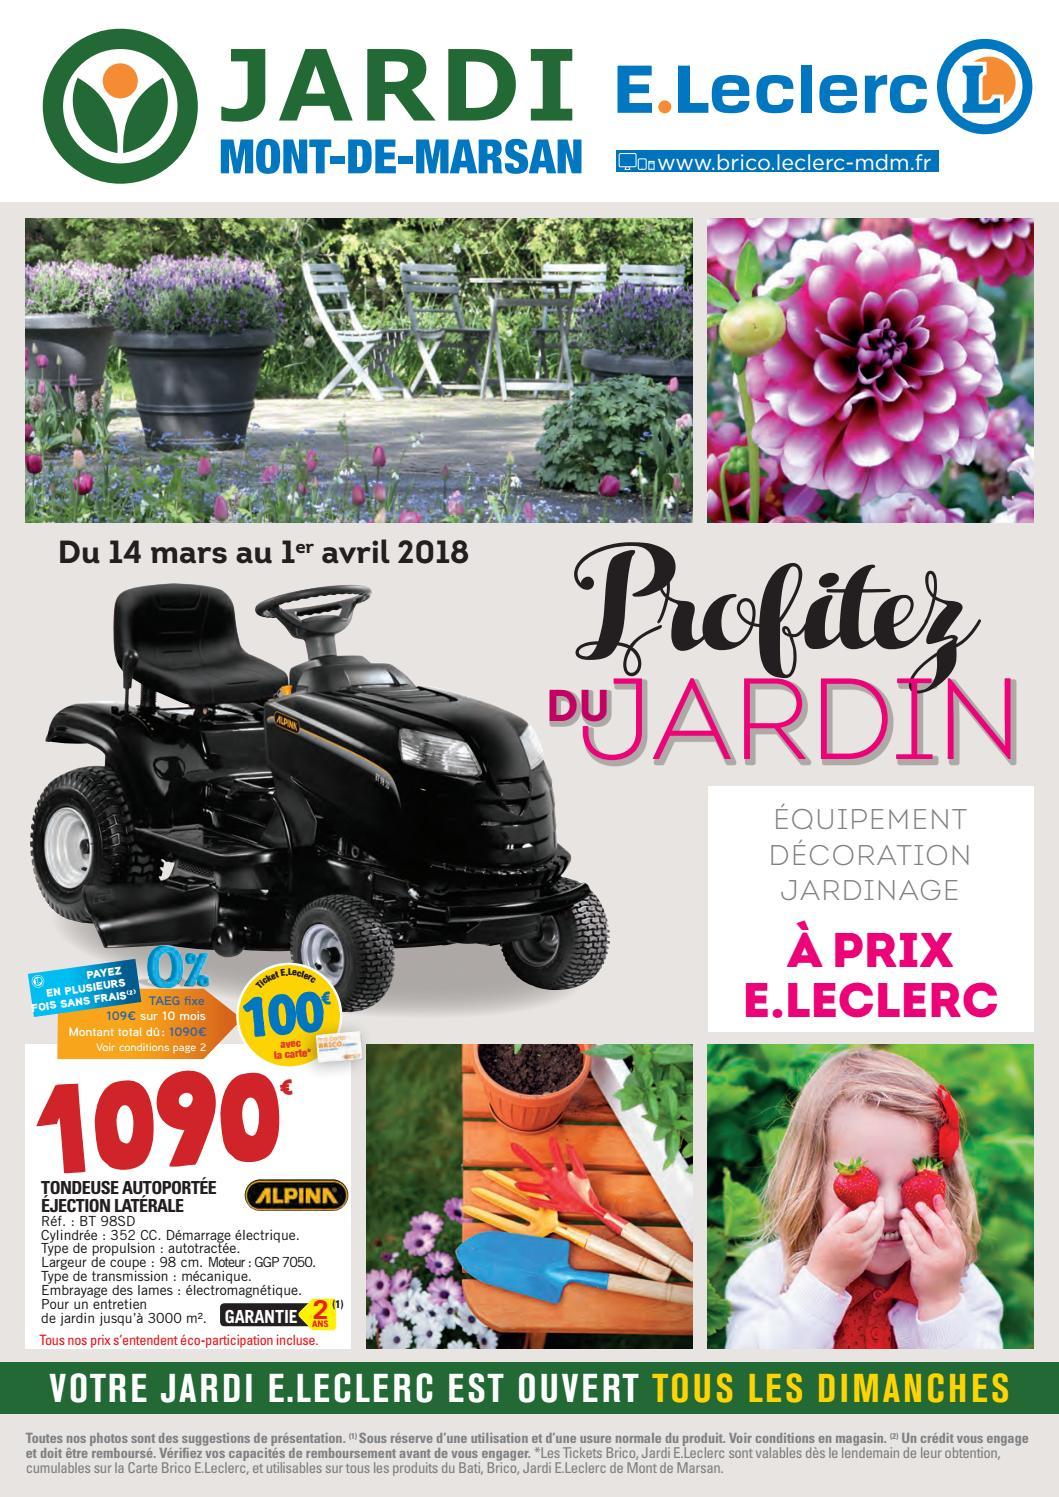 Catalogue Jardin - Jardi E.leclerc By Chou Magazine - Issuu tout Piscine Hors Sol Leclerc